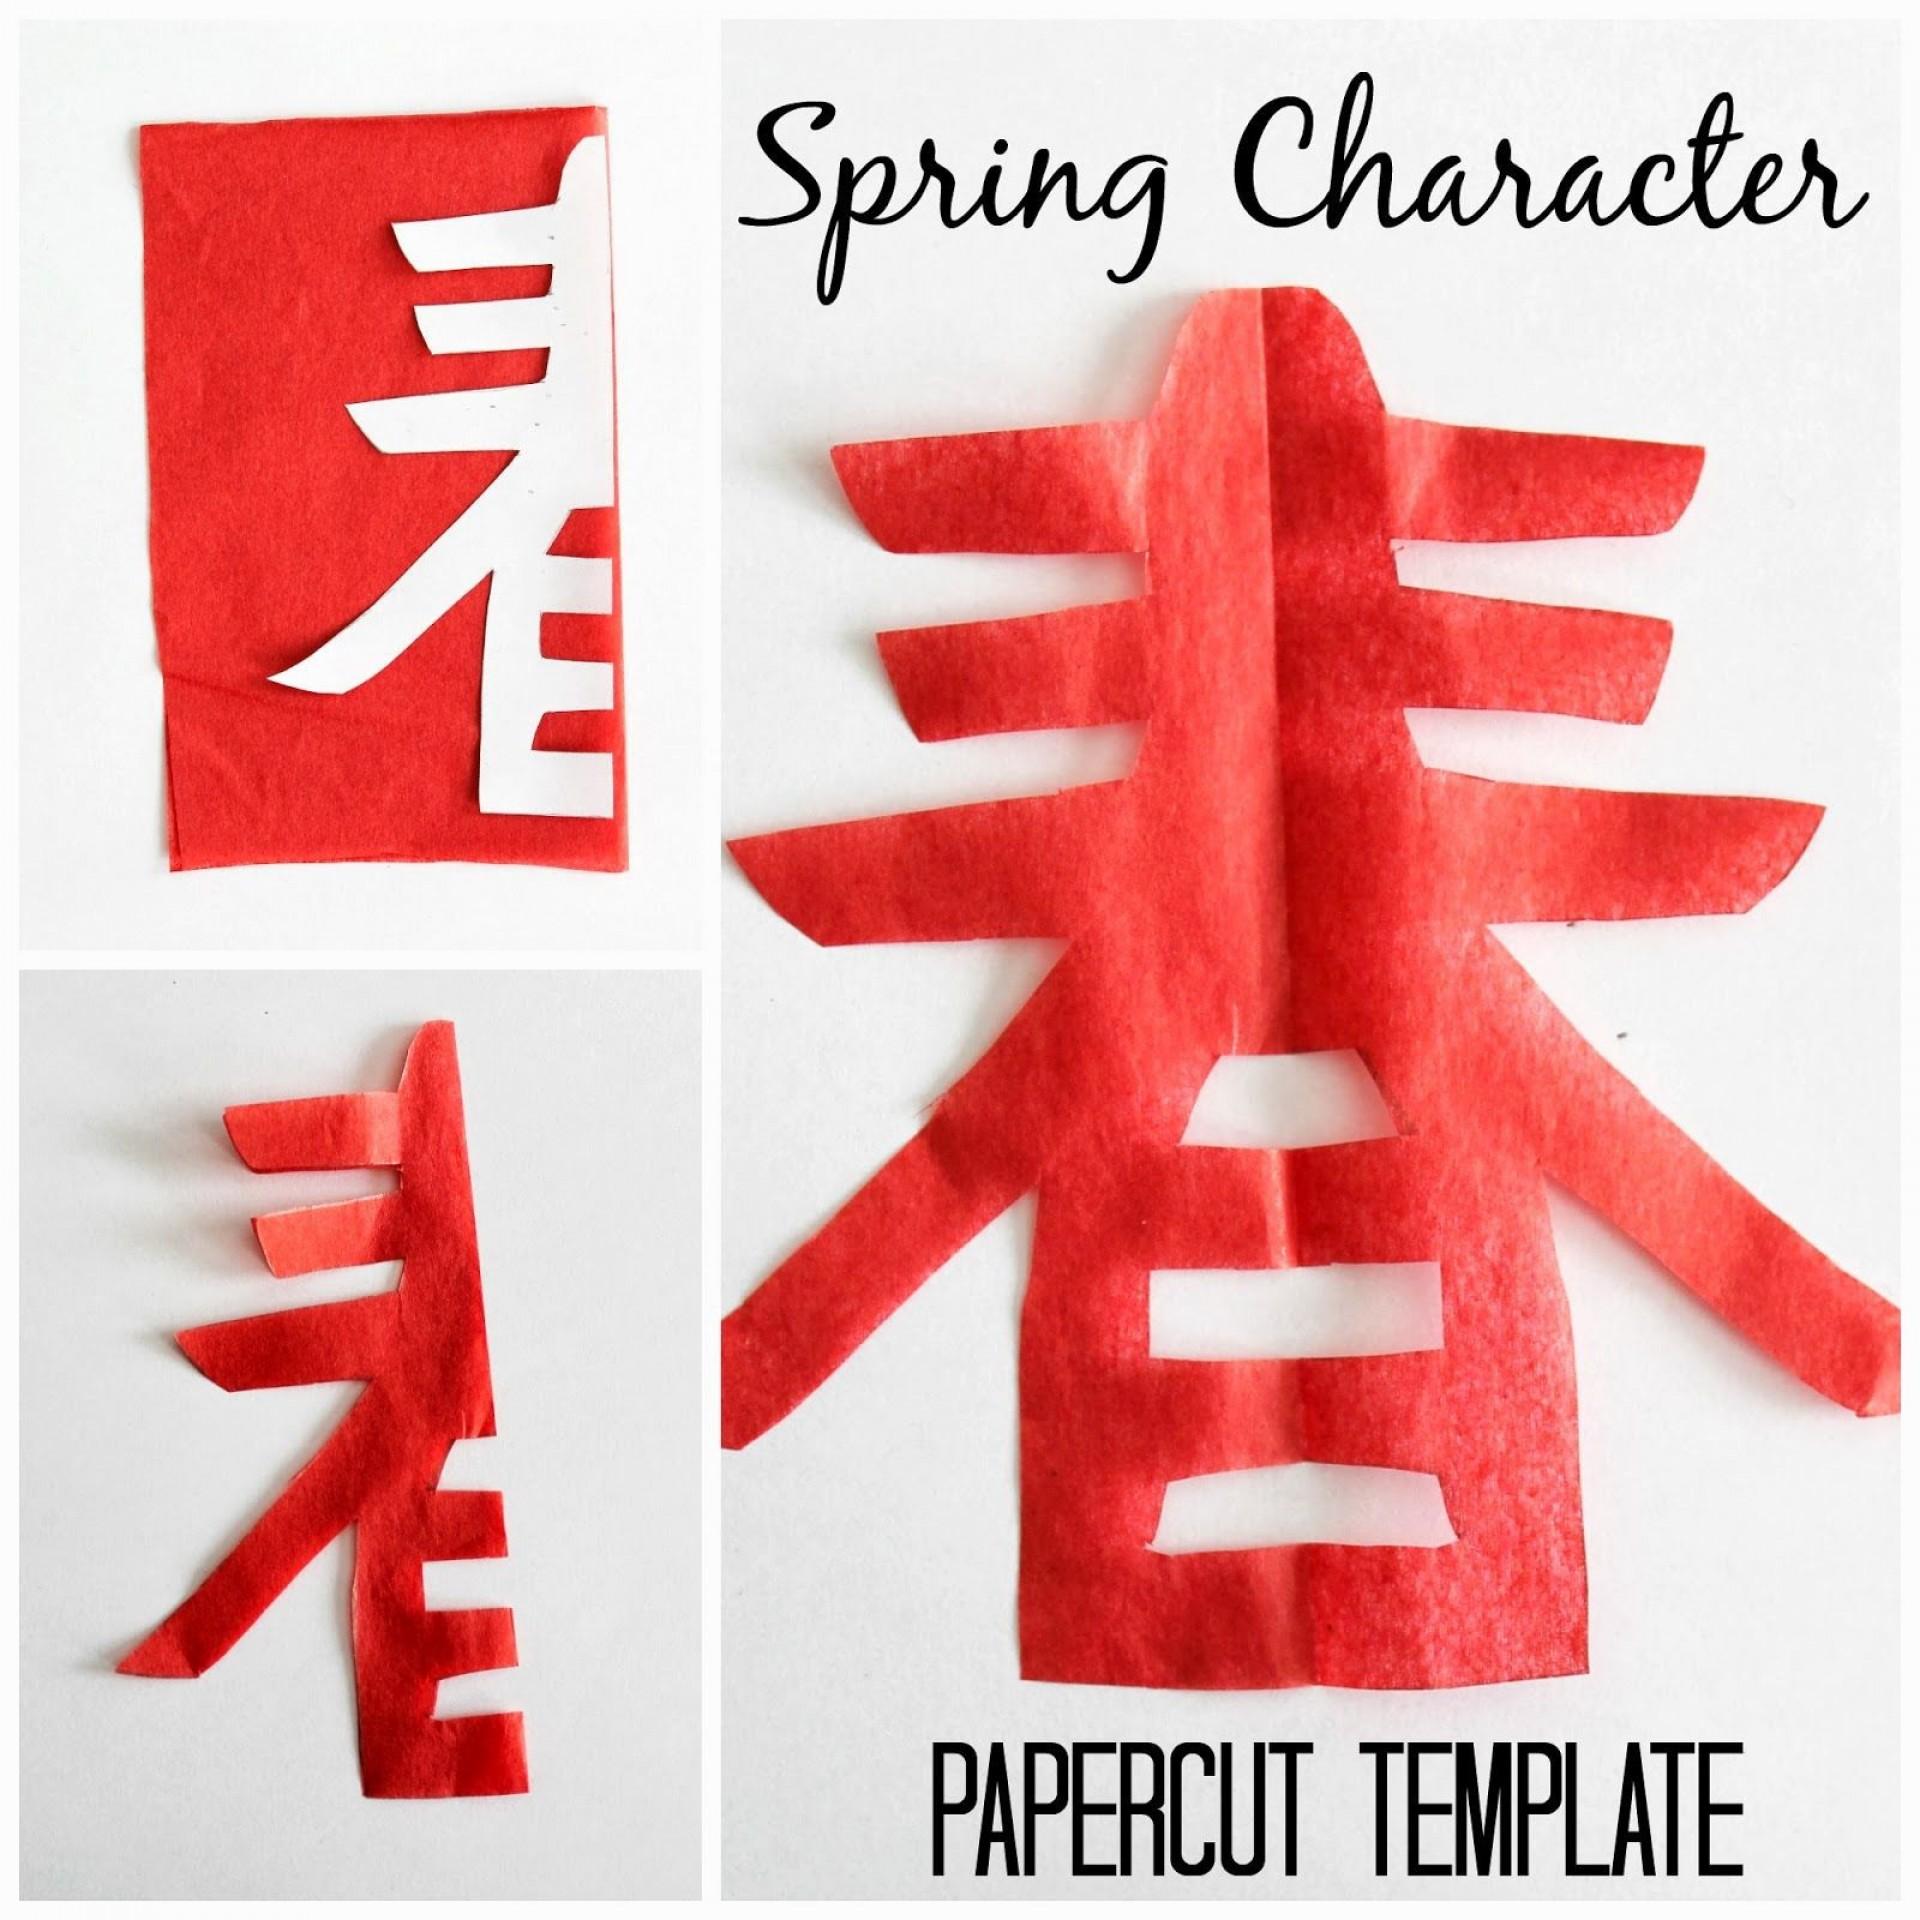 003 Unusual Chinese Paper Cut Template Highest Clarity  Templates Zodiac1920